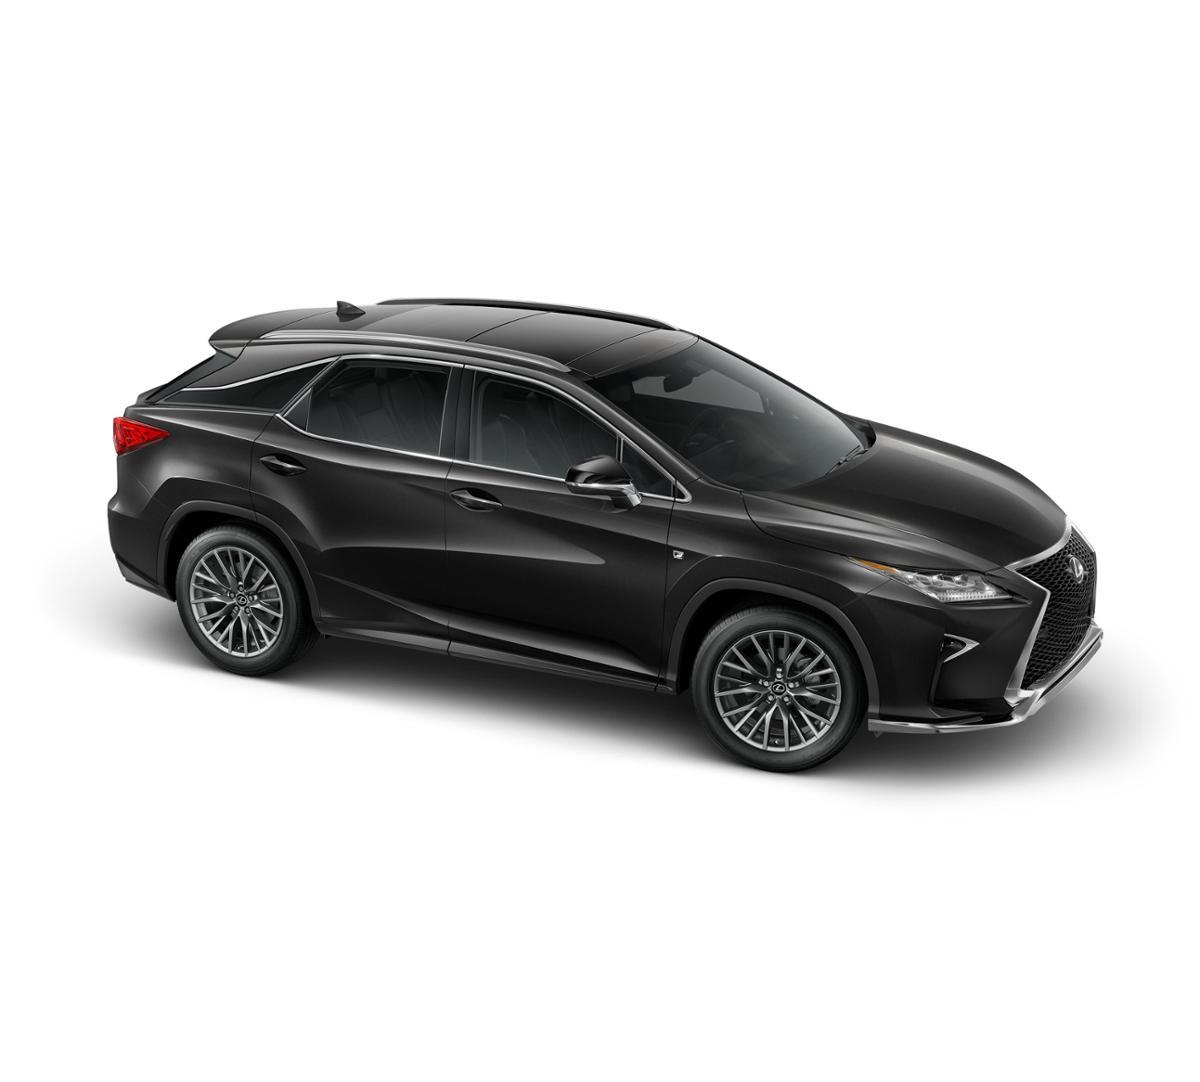 Lexus Rx350 Lease: Caviar 2019 Lexus RX 350 F SPORT Alexandria